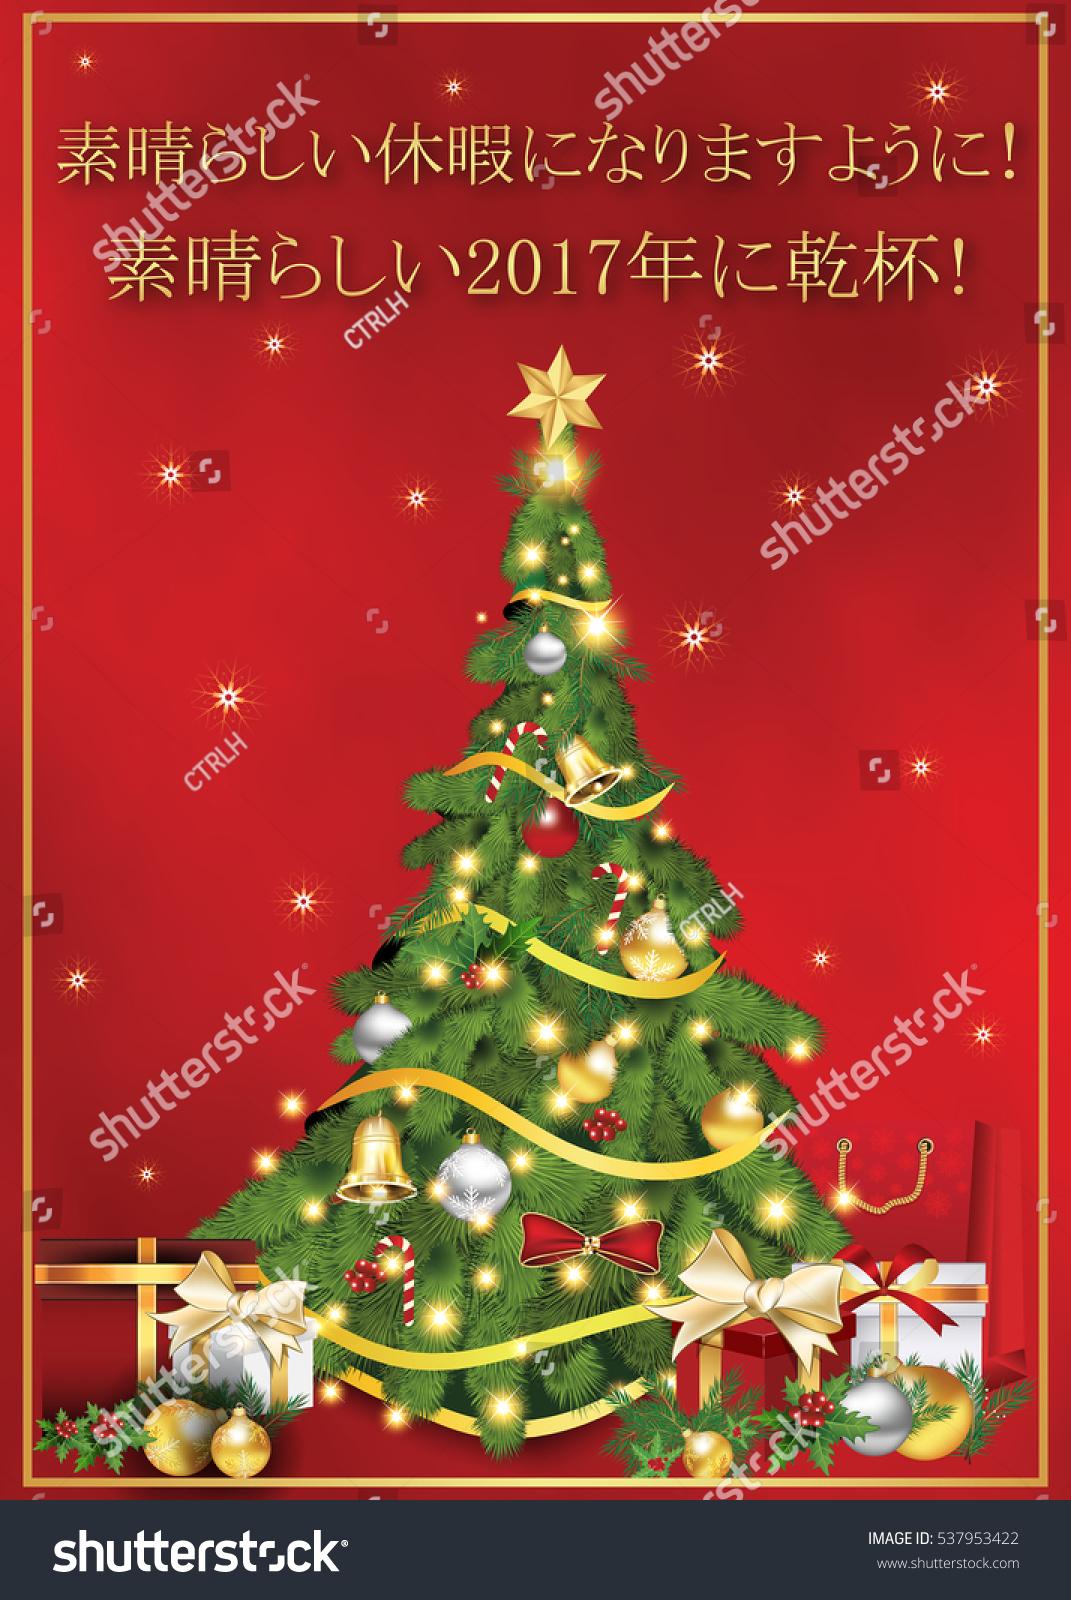 Royalty Free Stock Illustration Of Japanese Greeting Card We Wish